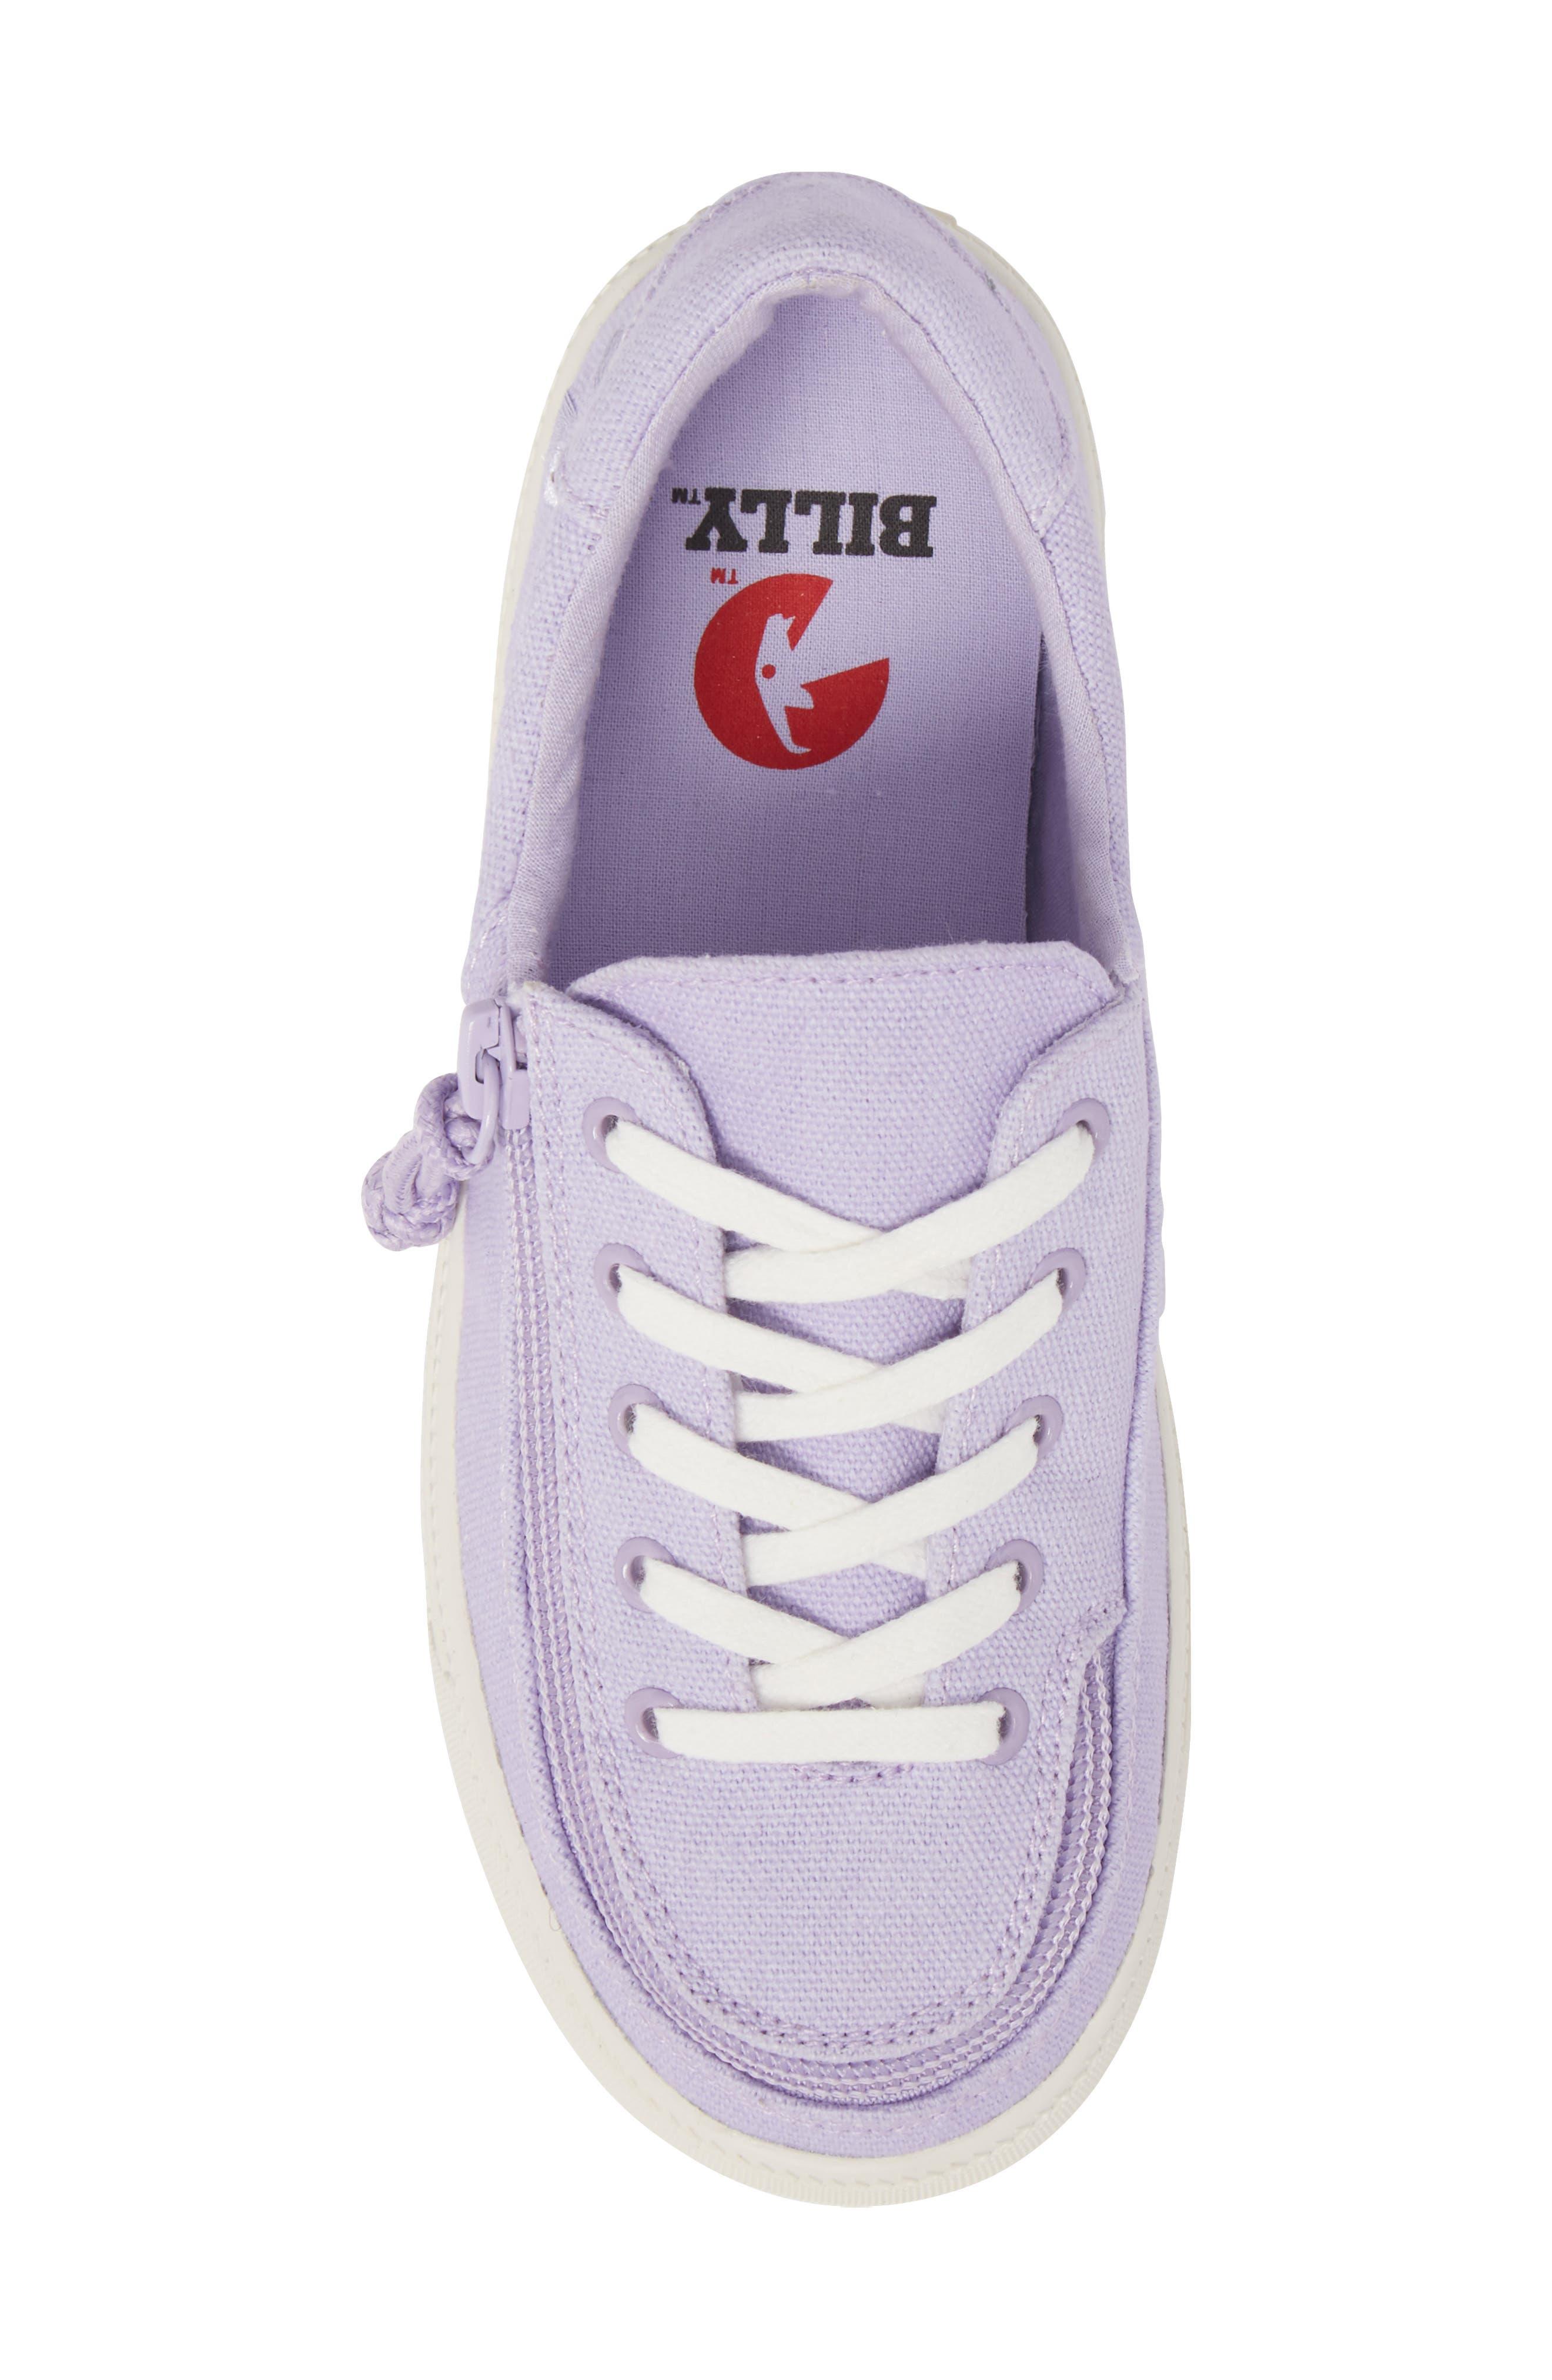 BILLY FOOTWEAR, Classic Zip Around Low Top Sneaker, Alternate thumbnail 6, color, LAVENDER